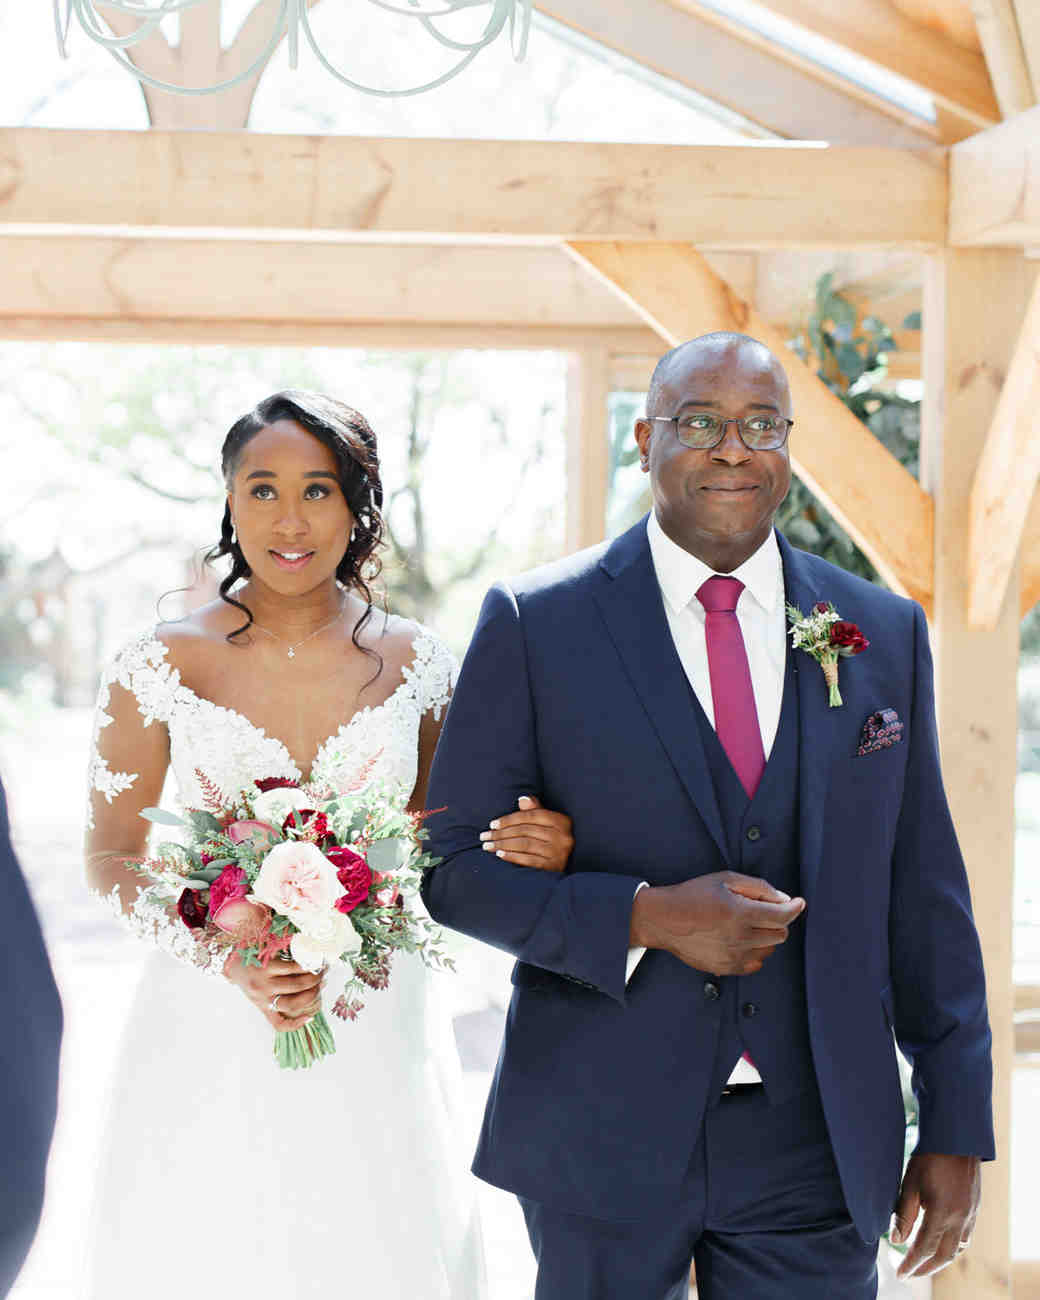 ryan thomas wedding processional bride and father